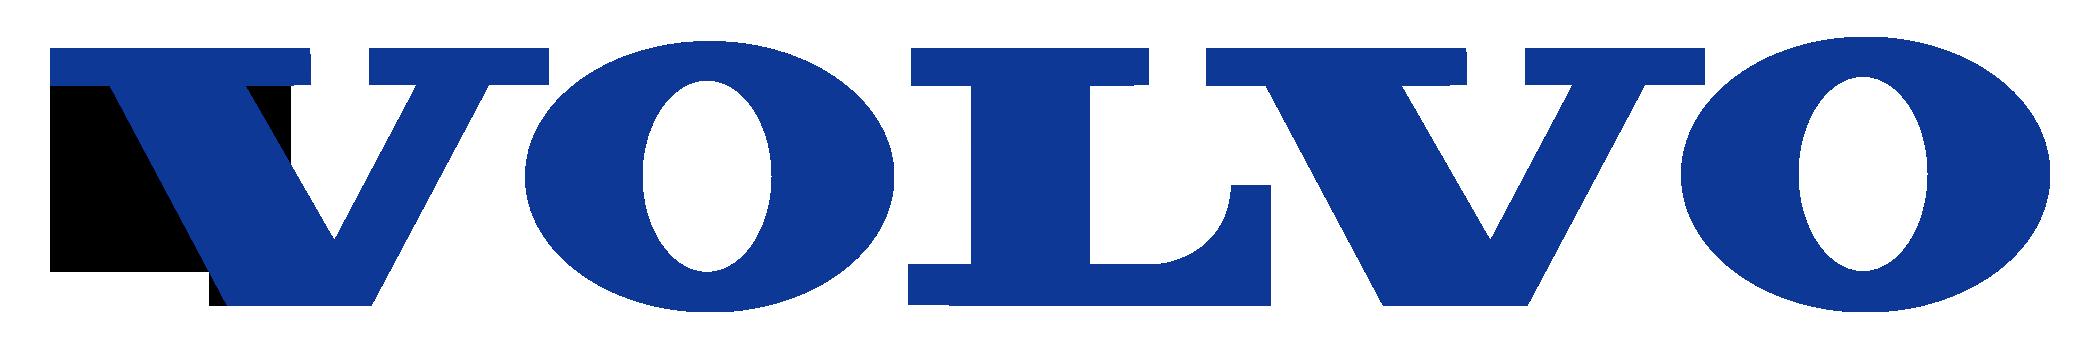 Volvo-text-logo-2100x350.png